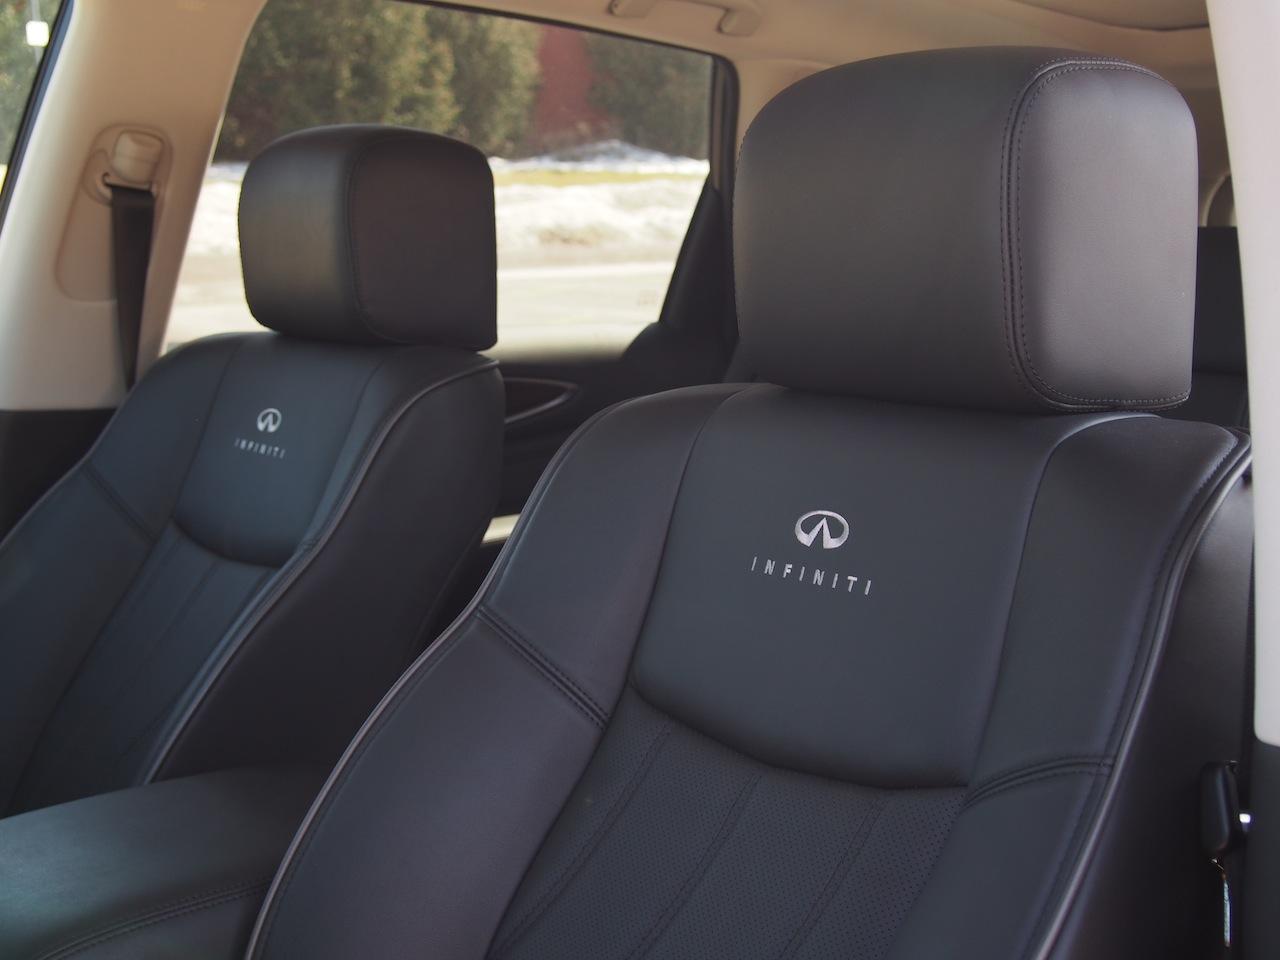 2014 Infiniti Qx60 Hybrid Review Cars Photos Test